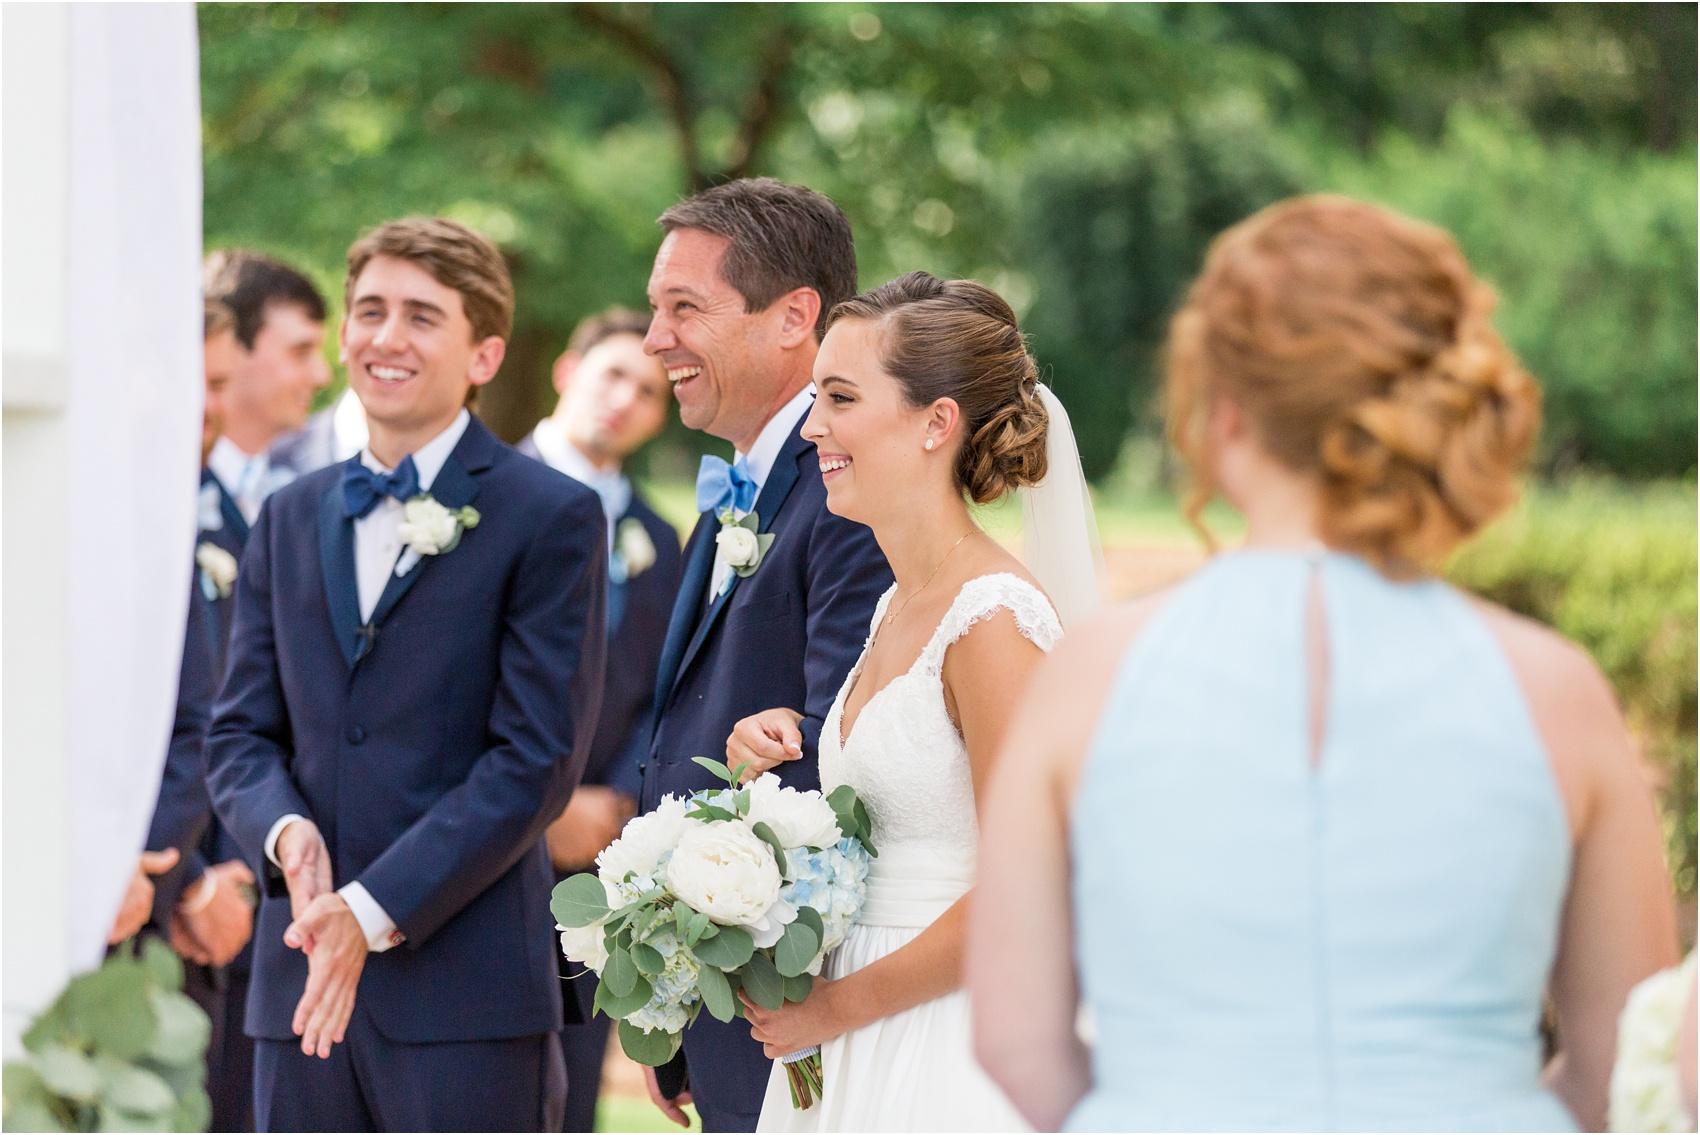 Savannah Eve Photography- Sigl-Adams Wedding- Sneak Peek-35.jpg